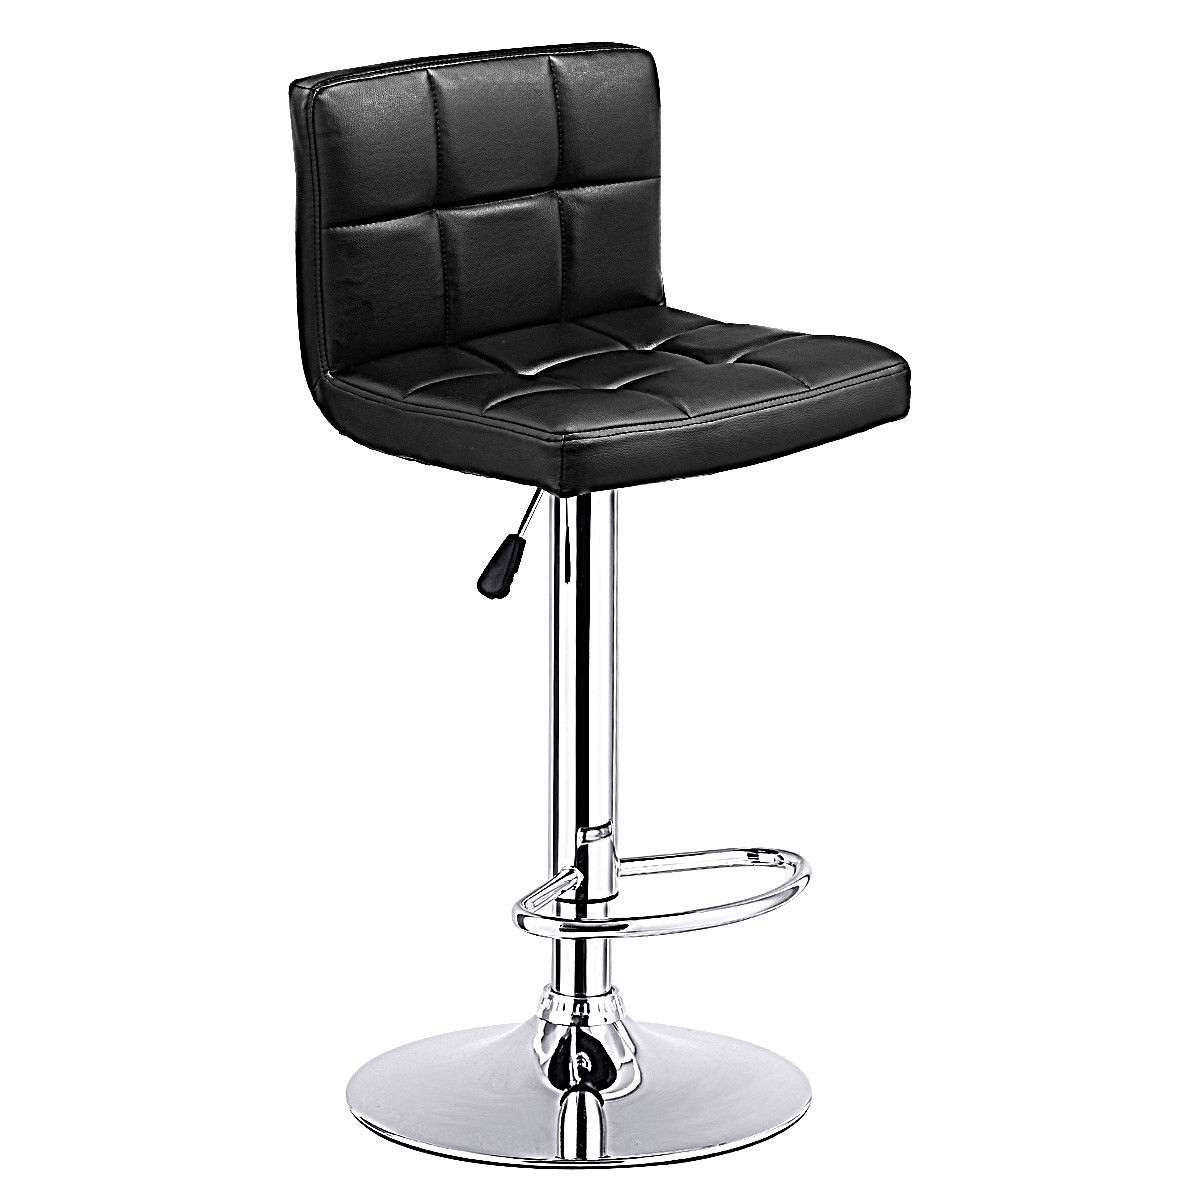 Costway 1 PC Bar Stool Swivel Adjustable PU Leather Barstools Bistro Pub  Chair Black